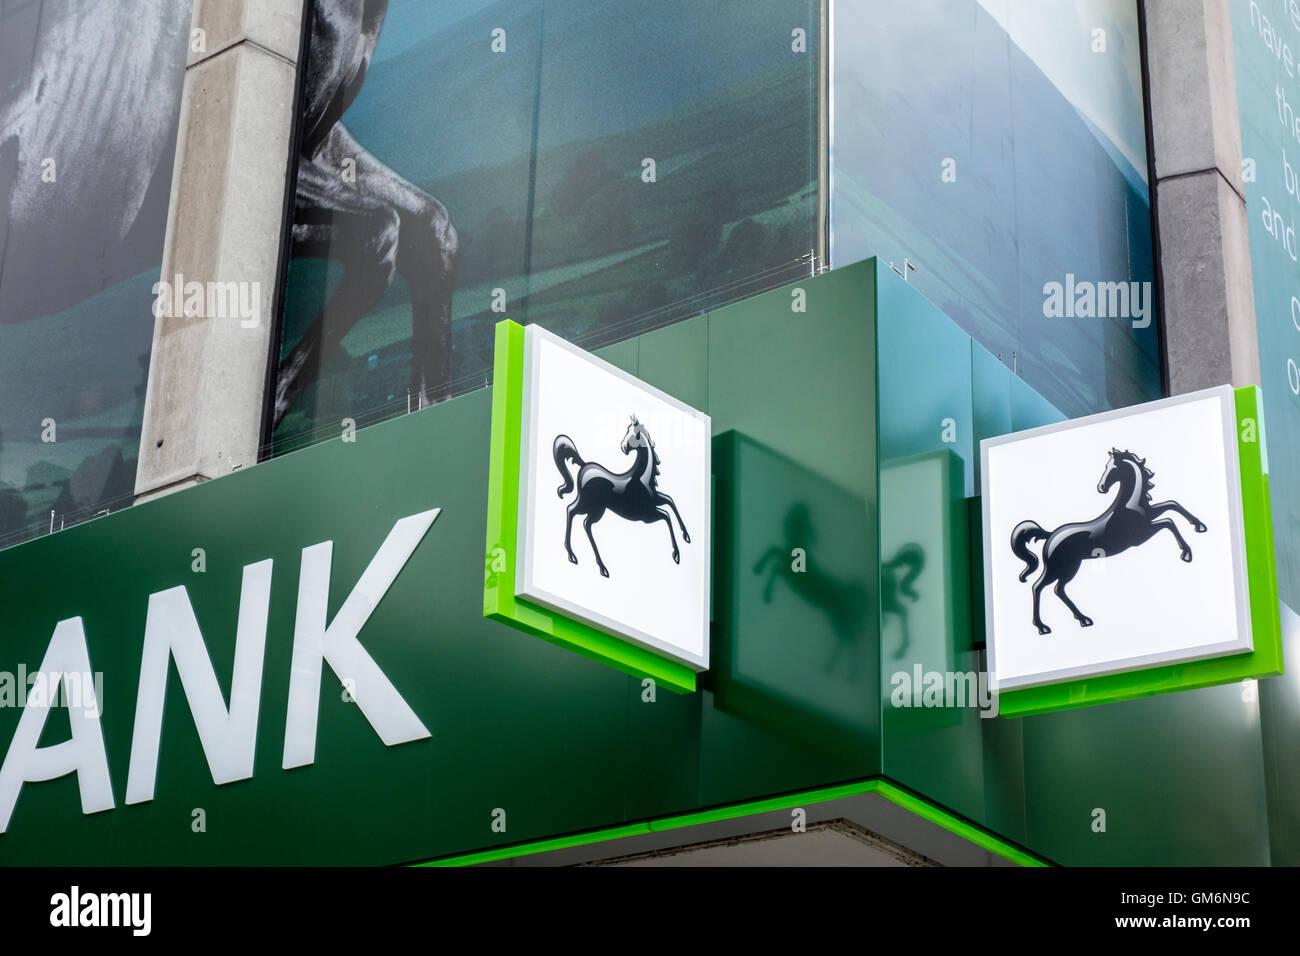 Lloyds Bank exterior sign, Oxford Street, London, UK - Stock Image